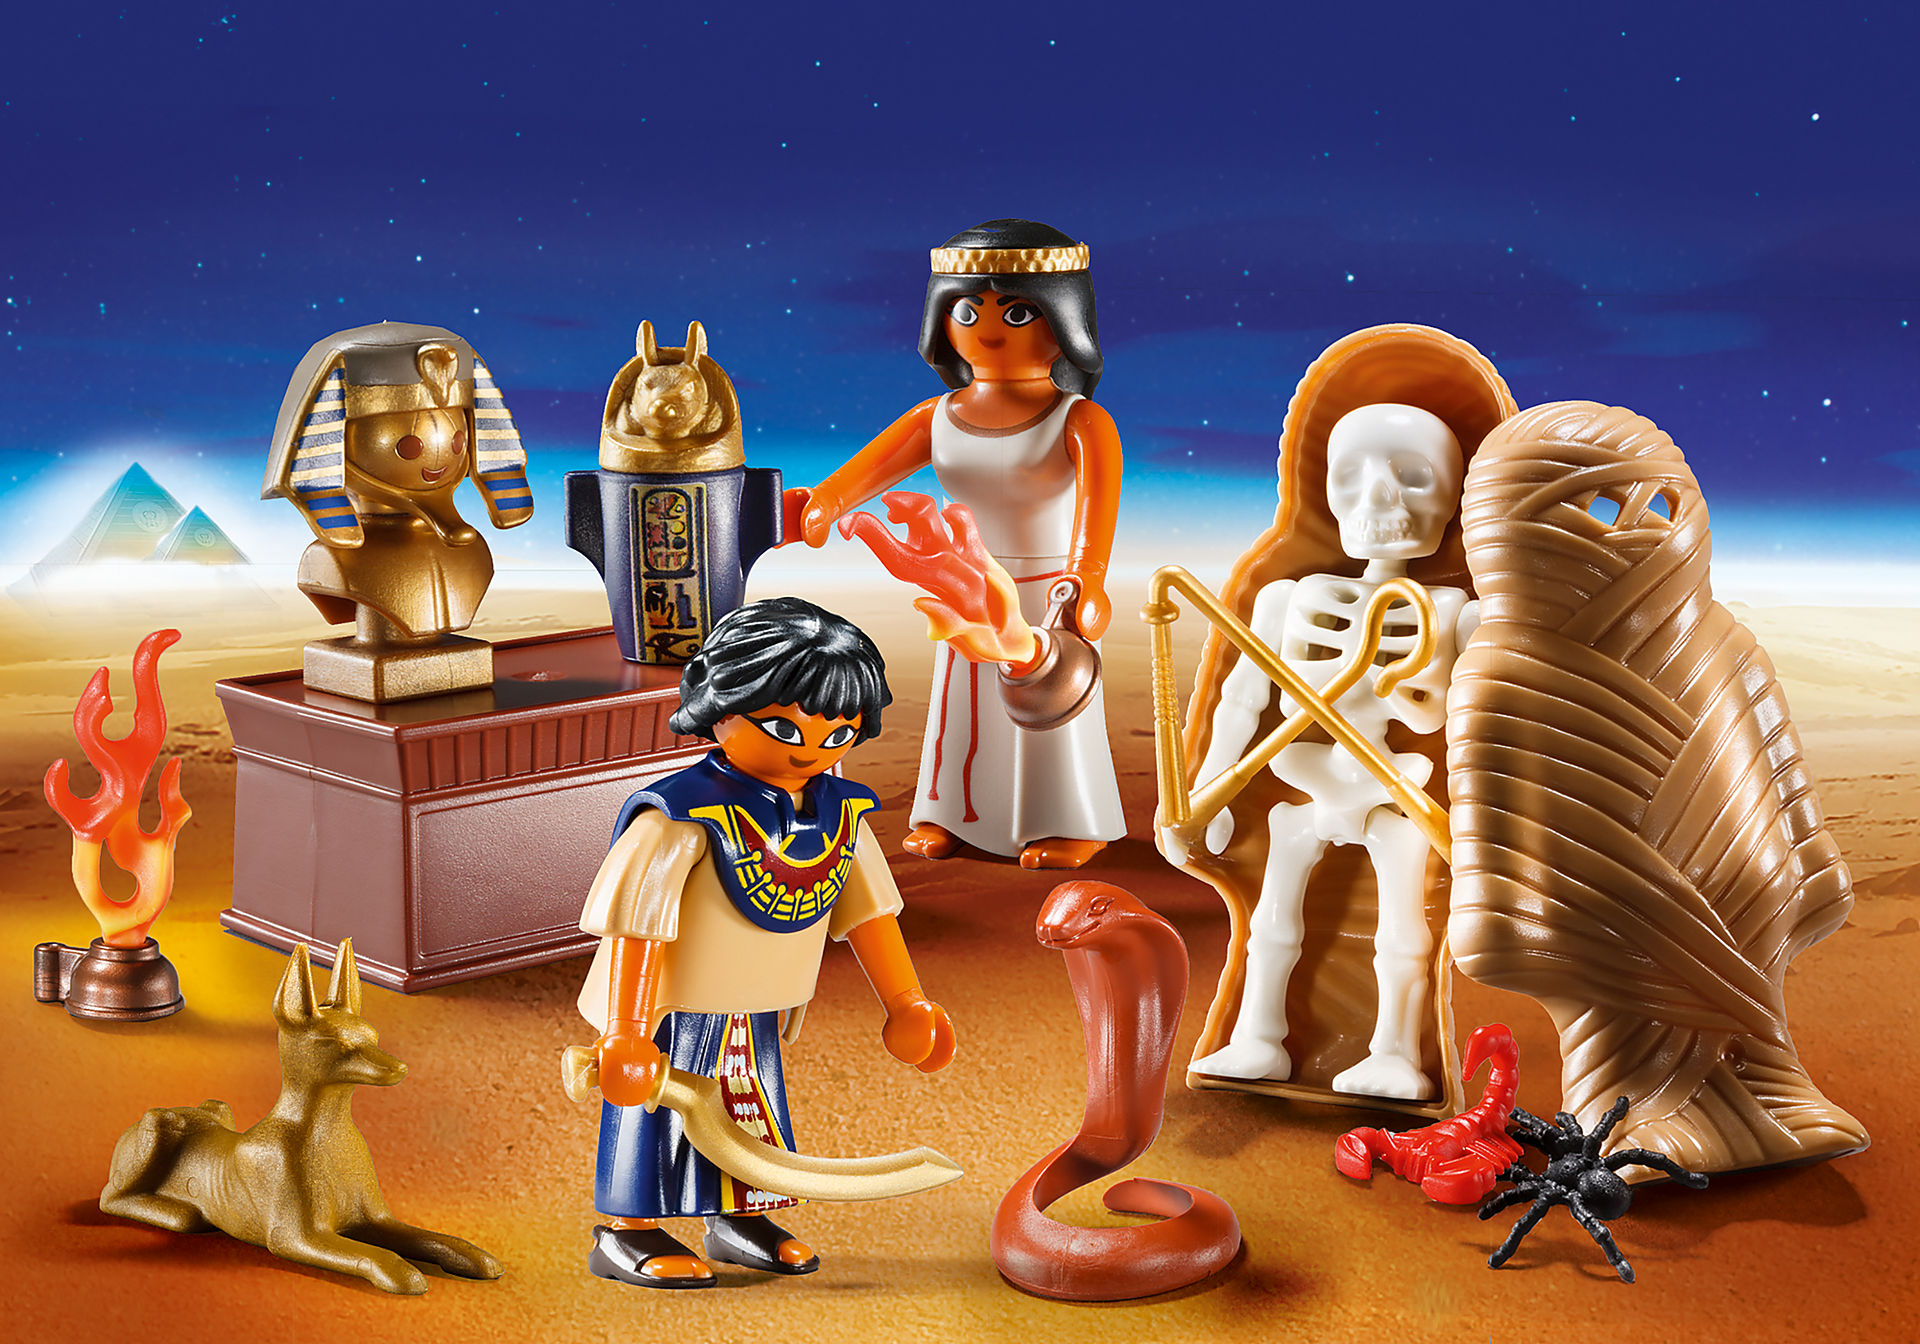 9542 Maxi Βαλιτσάκι Aρχαία Αίγυπτος zoom image1